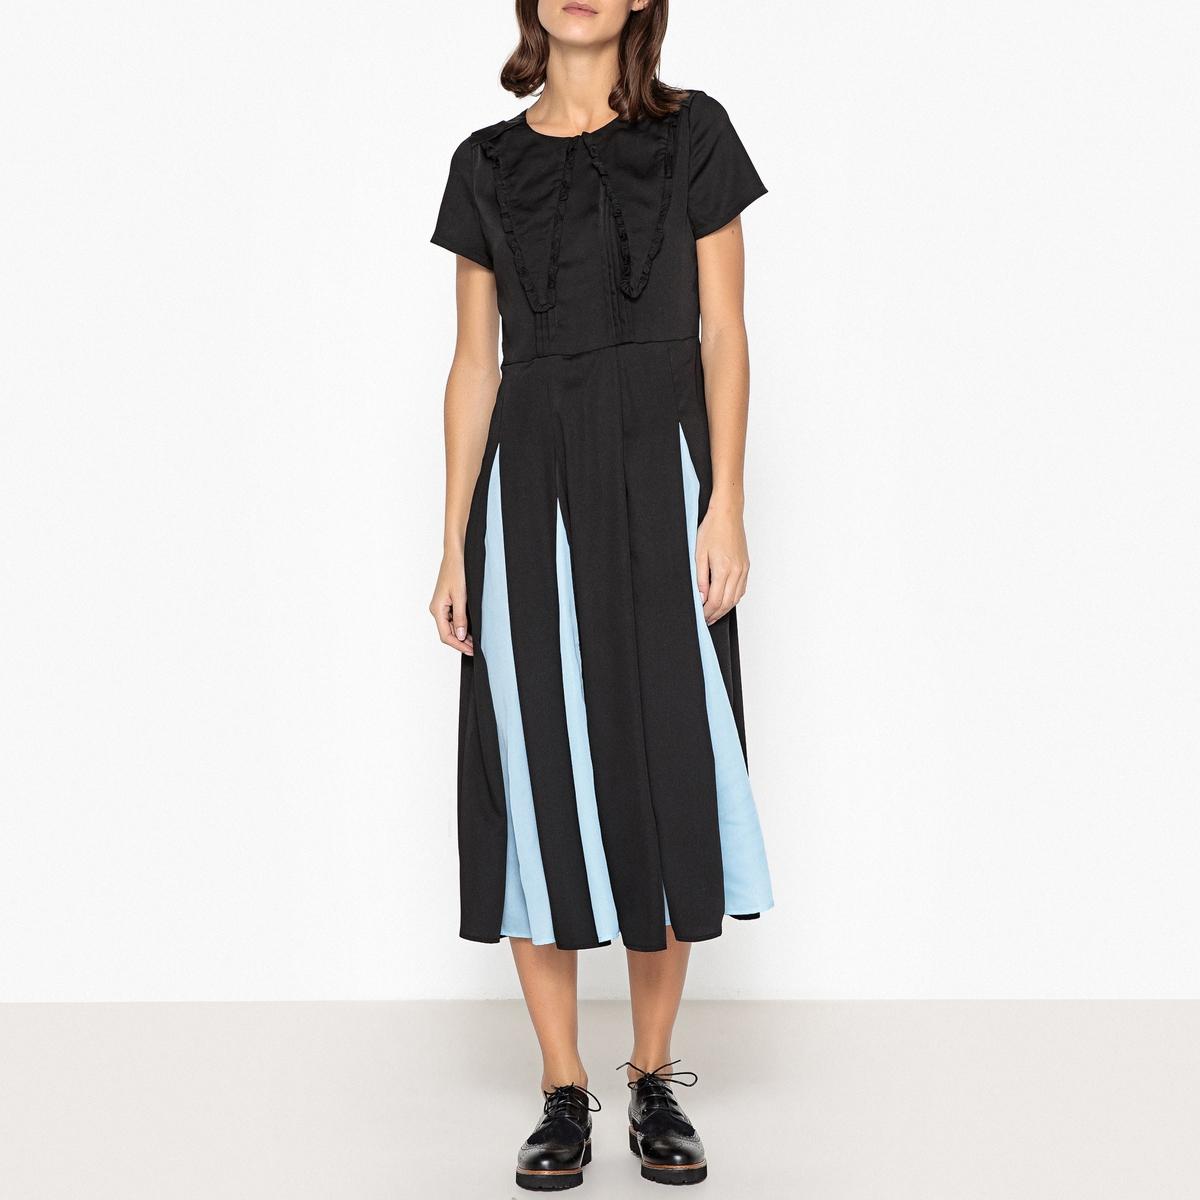 Платье SISTER JANE 14434445 от LaRedoute